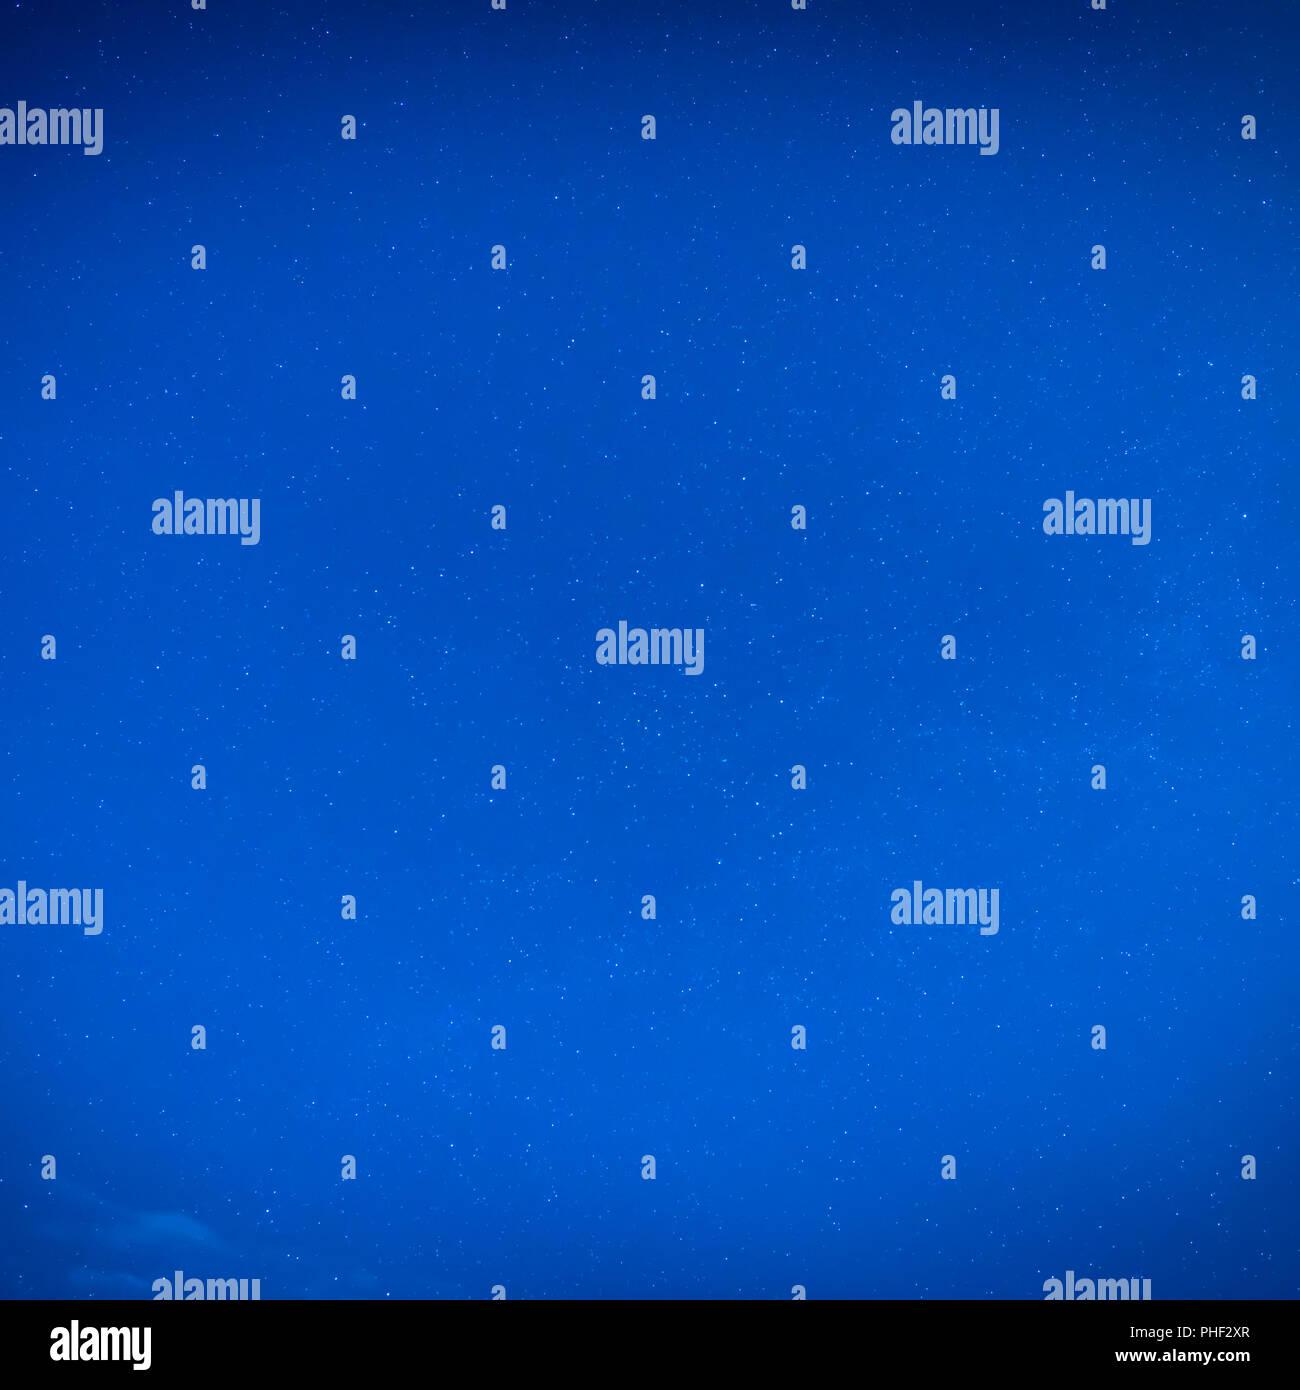 Blue night sky with many stars - Stock Image